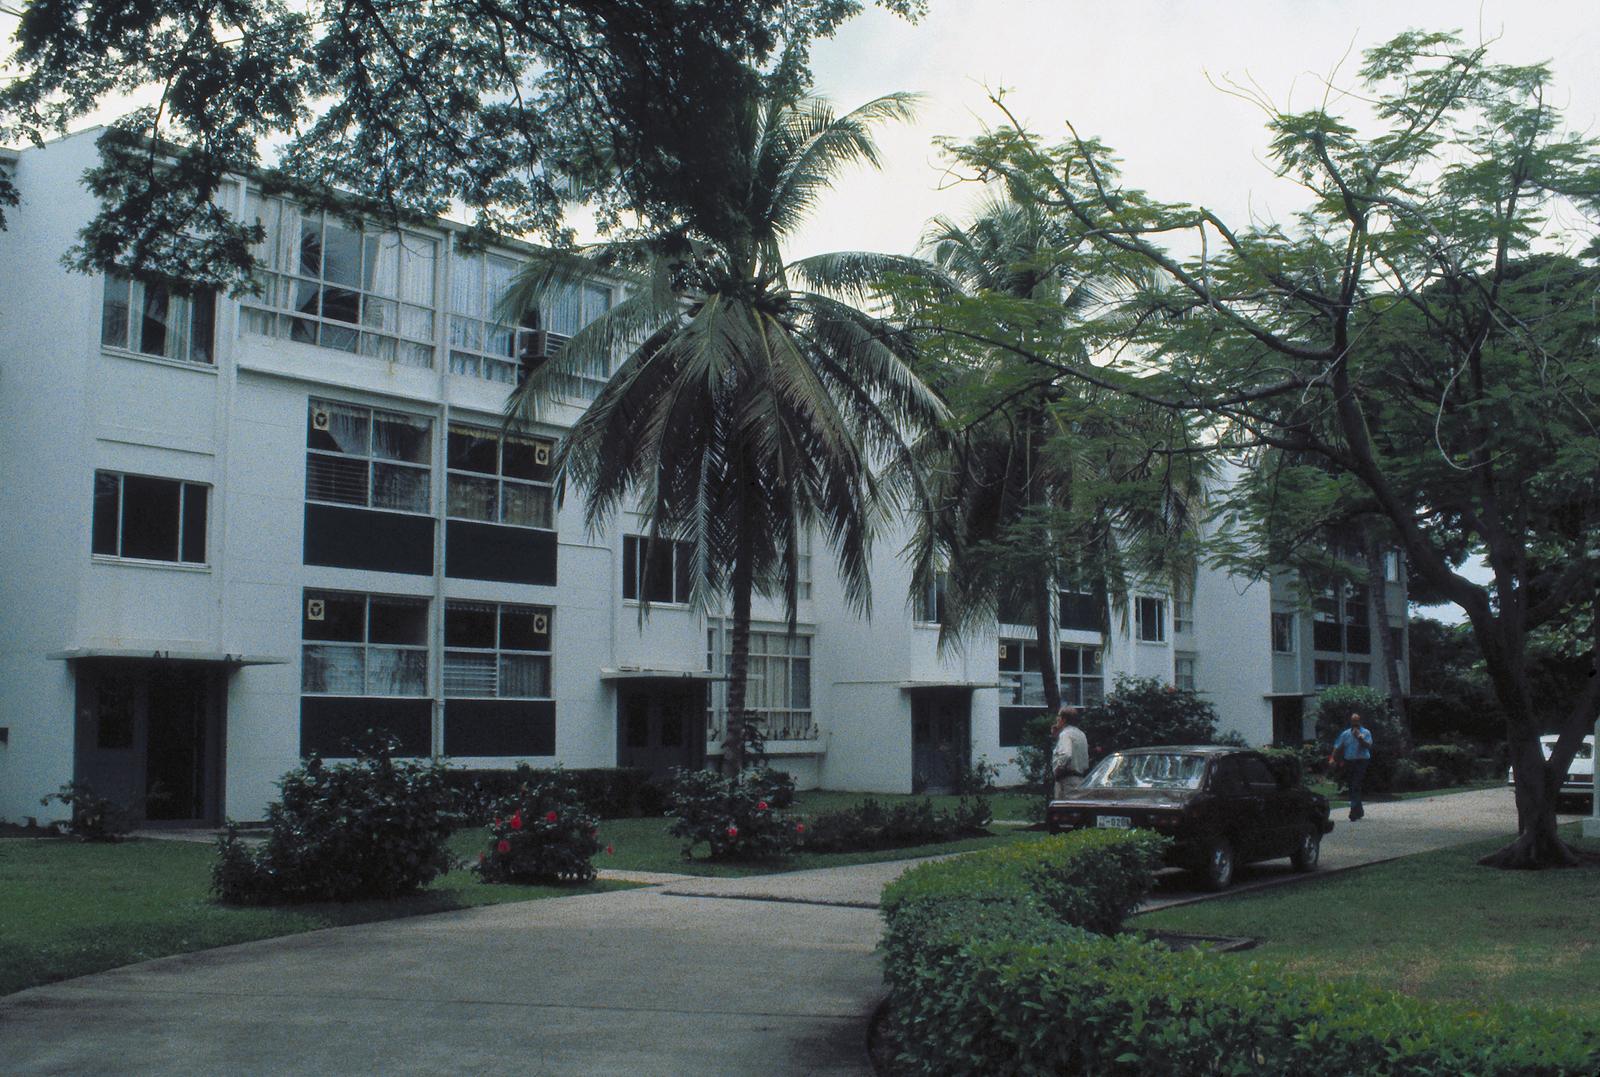 Bangkok - Multi-Unit Residential Building - 1981